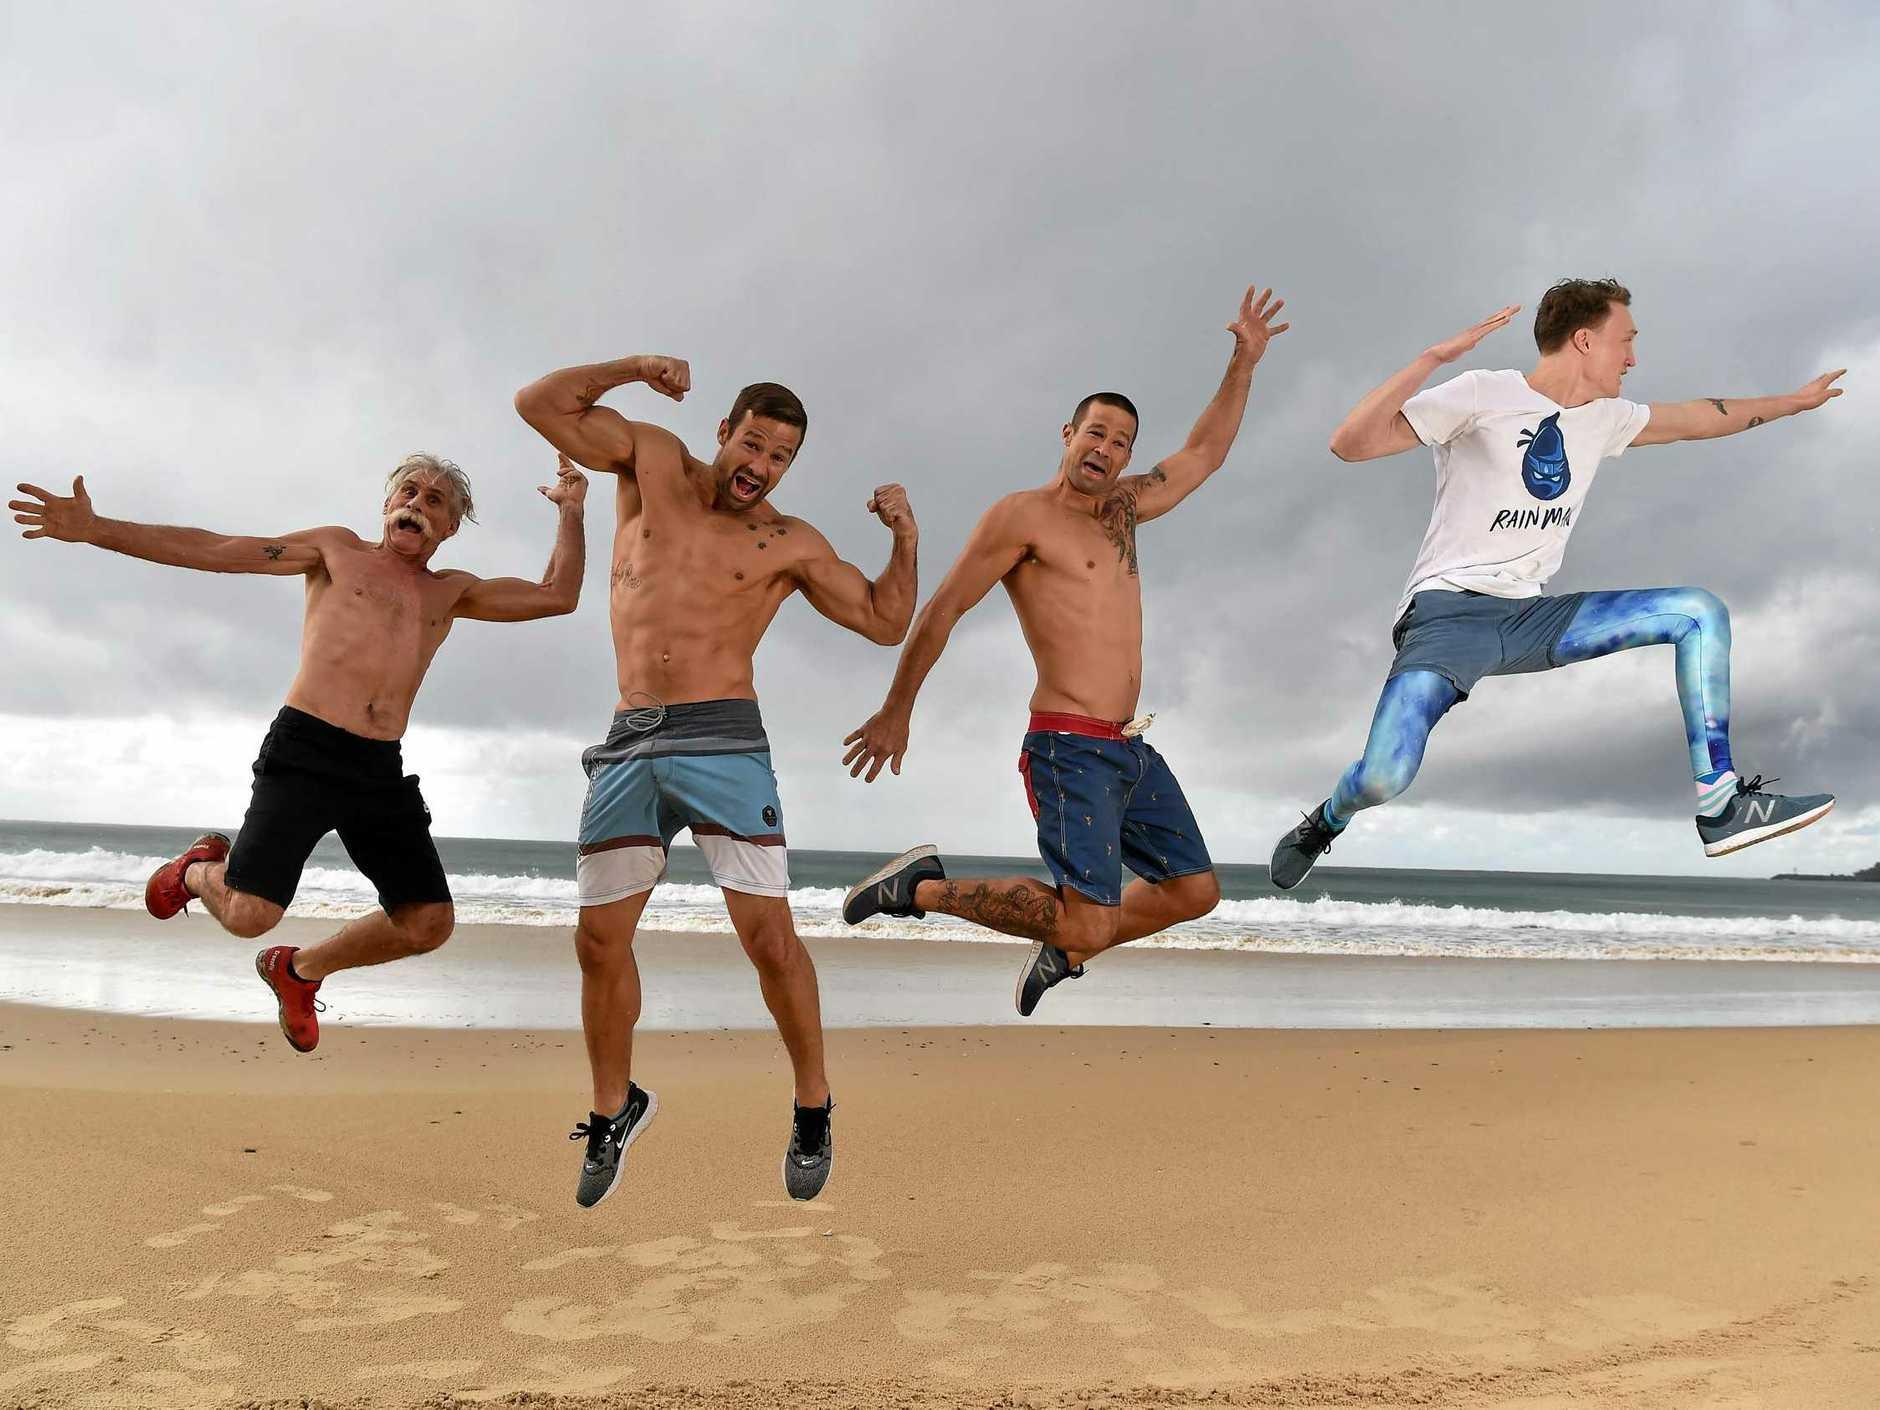 Sunny Coasters competing in the new season of Australian Ninja Warrior. Pa Rambo (real name Ian Newland) Matt and Luke Filippi and Rainer Scheu ready for action.